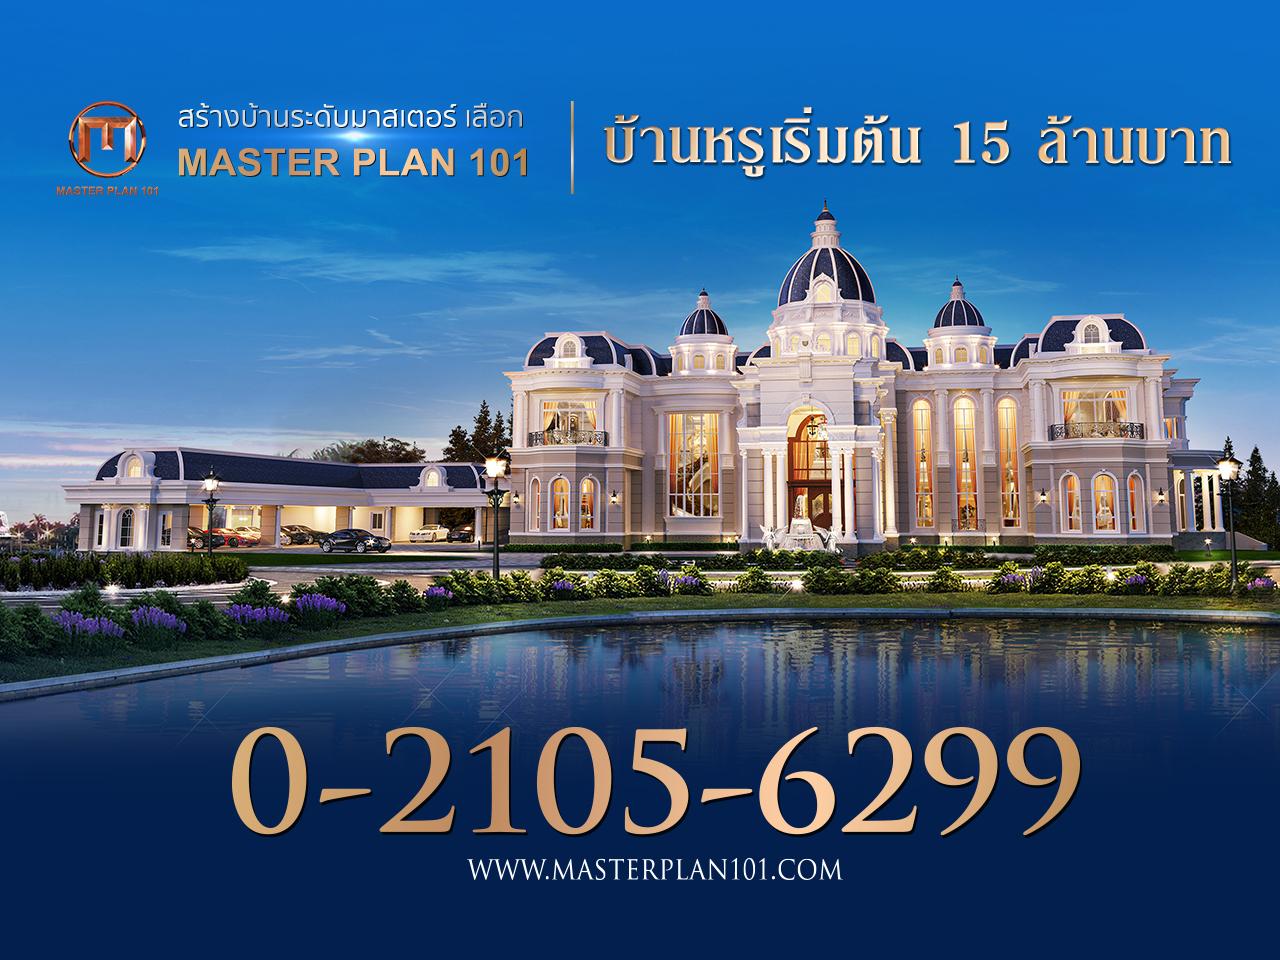 masterplan - 1/04/21 - A1 Mobile